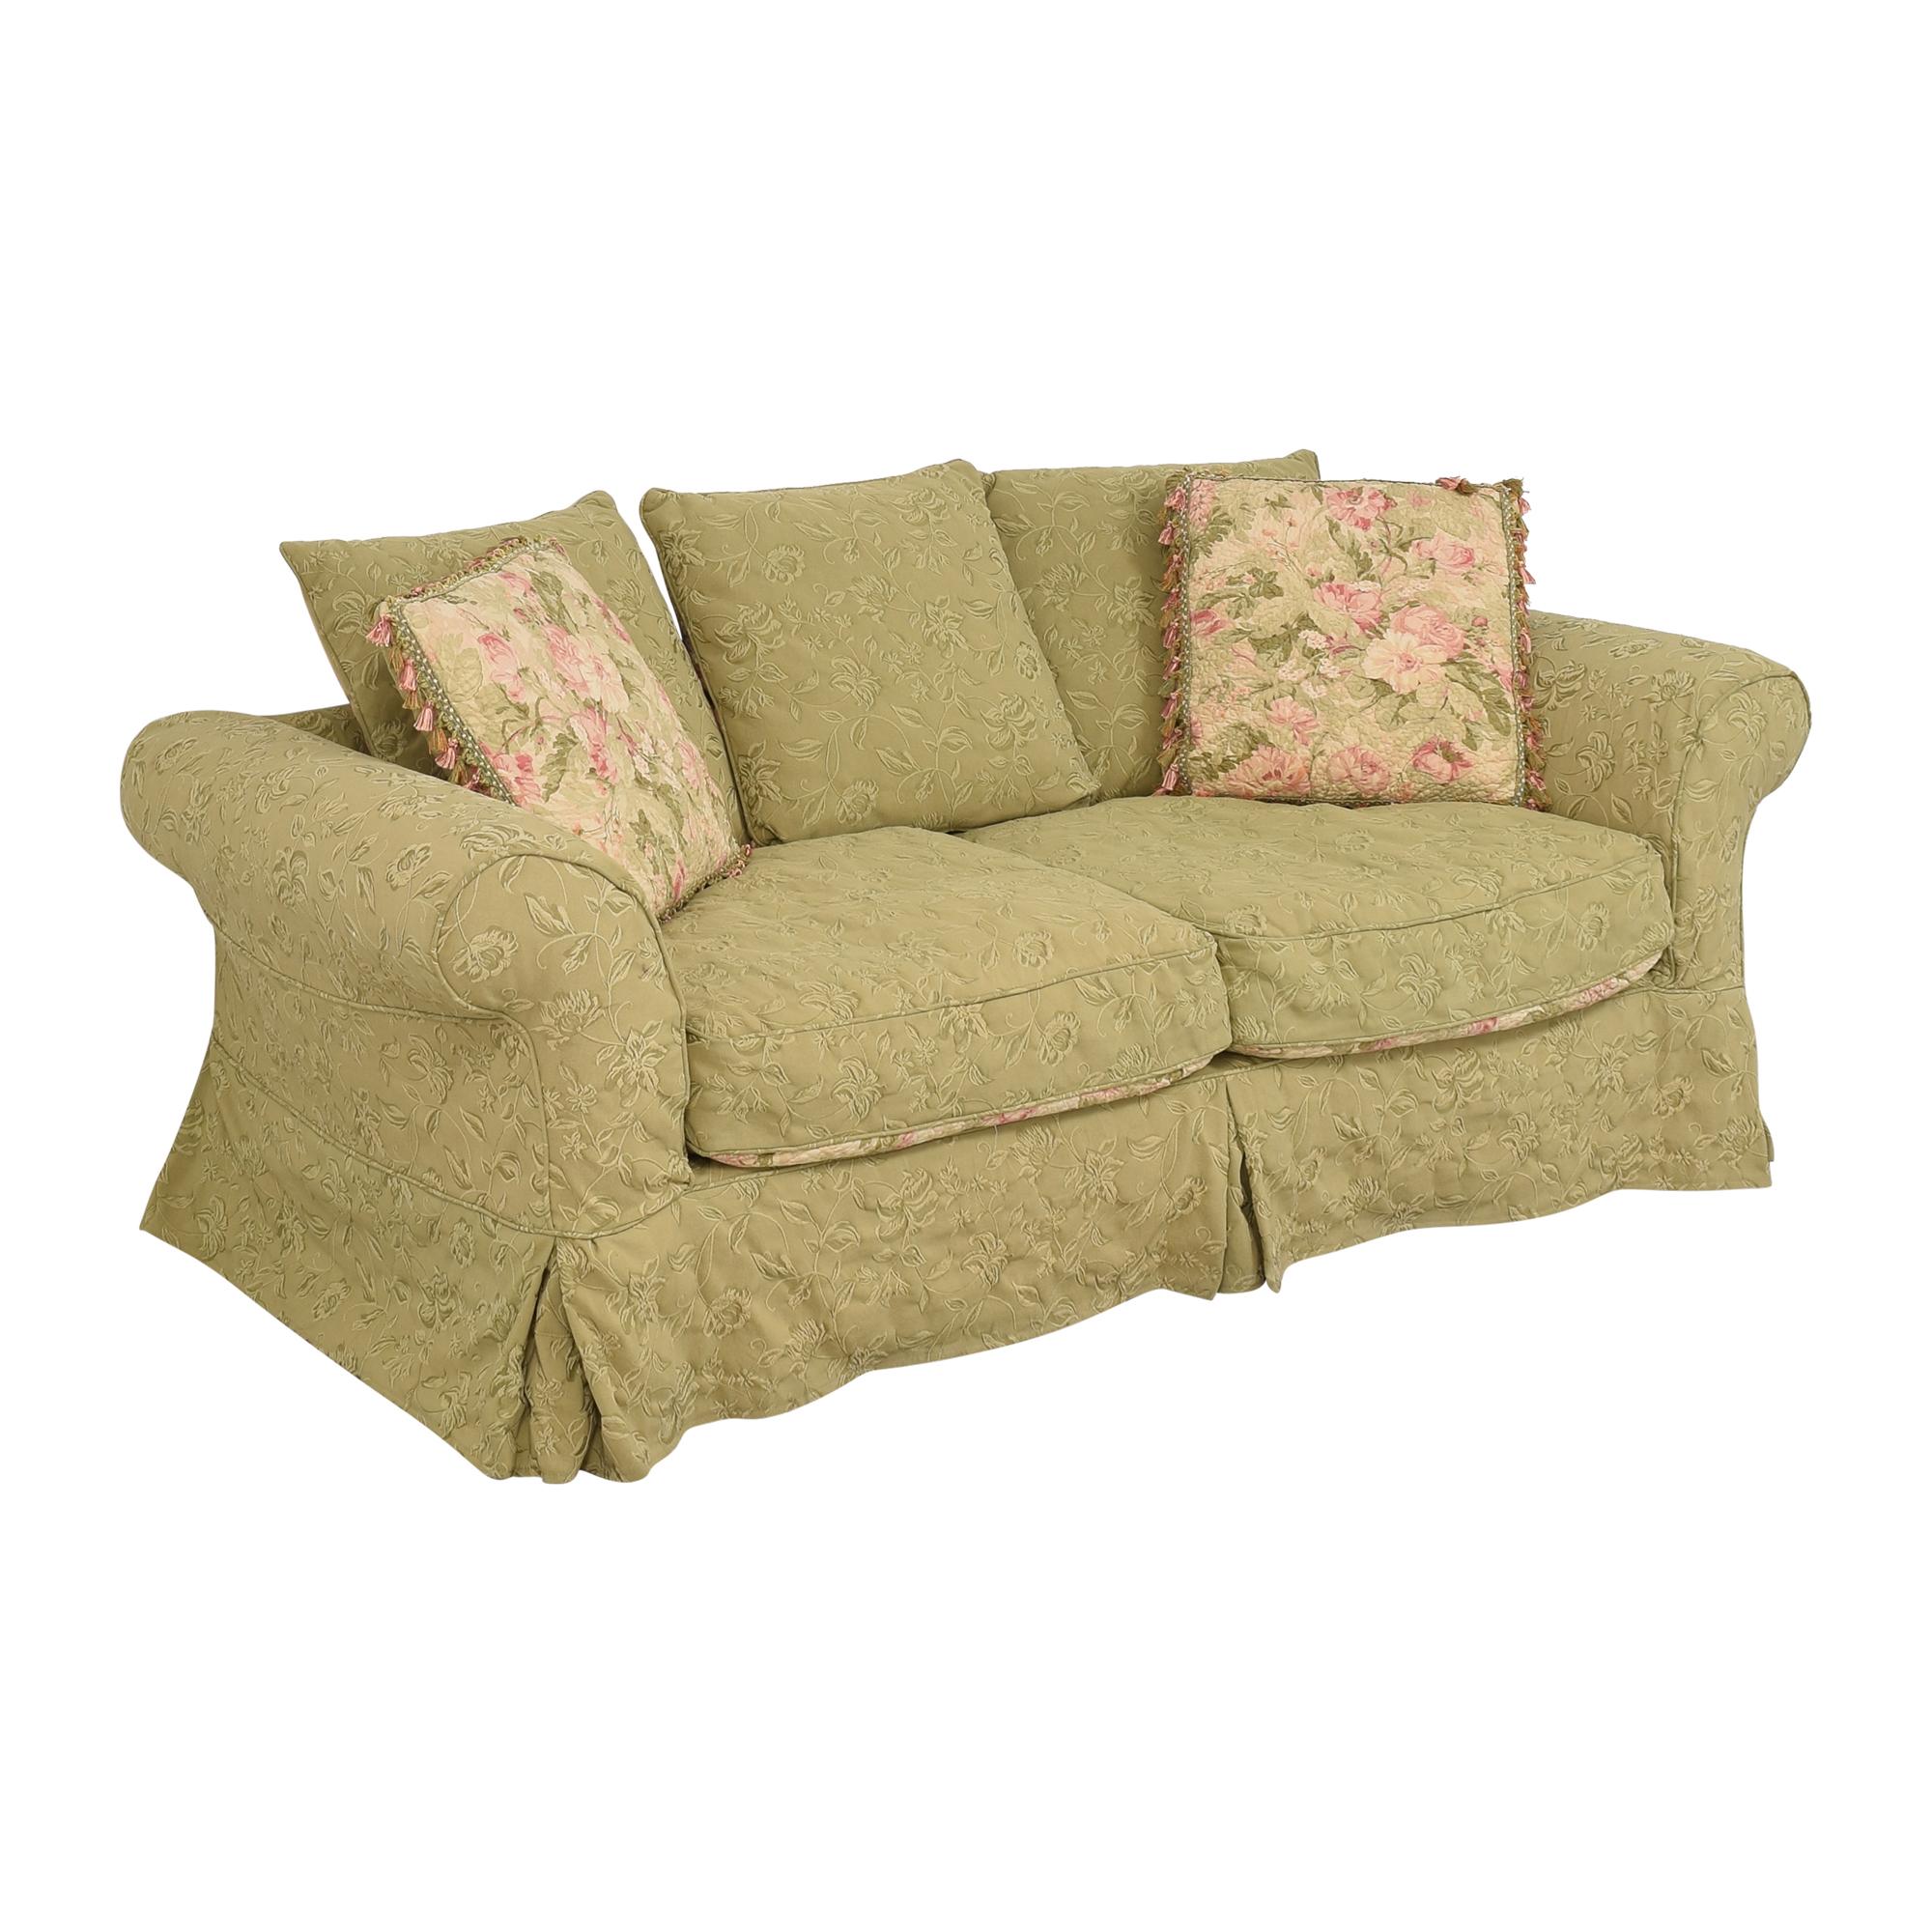 Domain Domain Floral Slipcovered Sofa Sofas